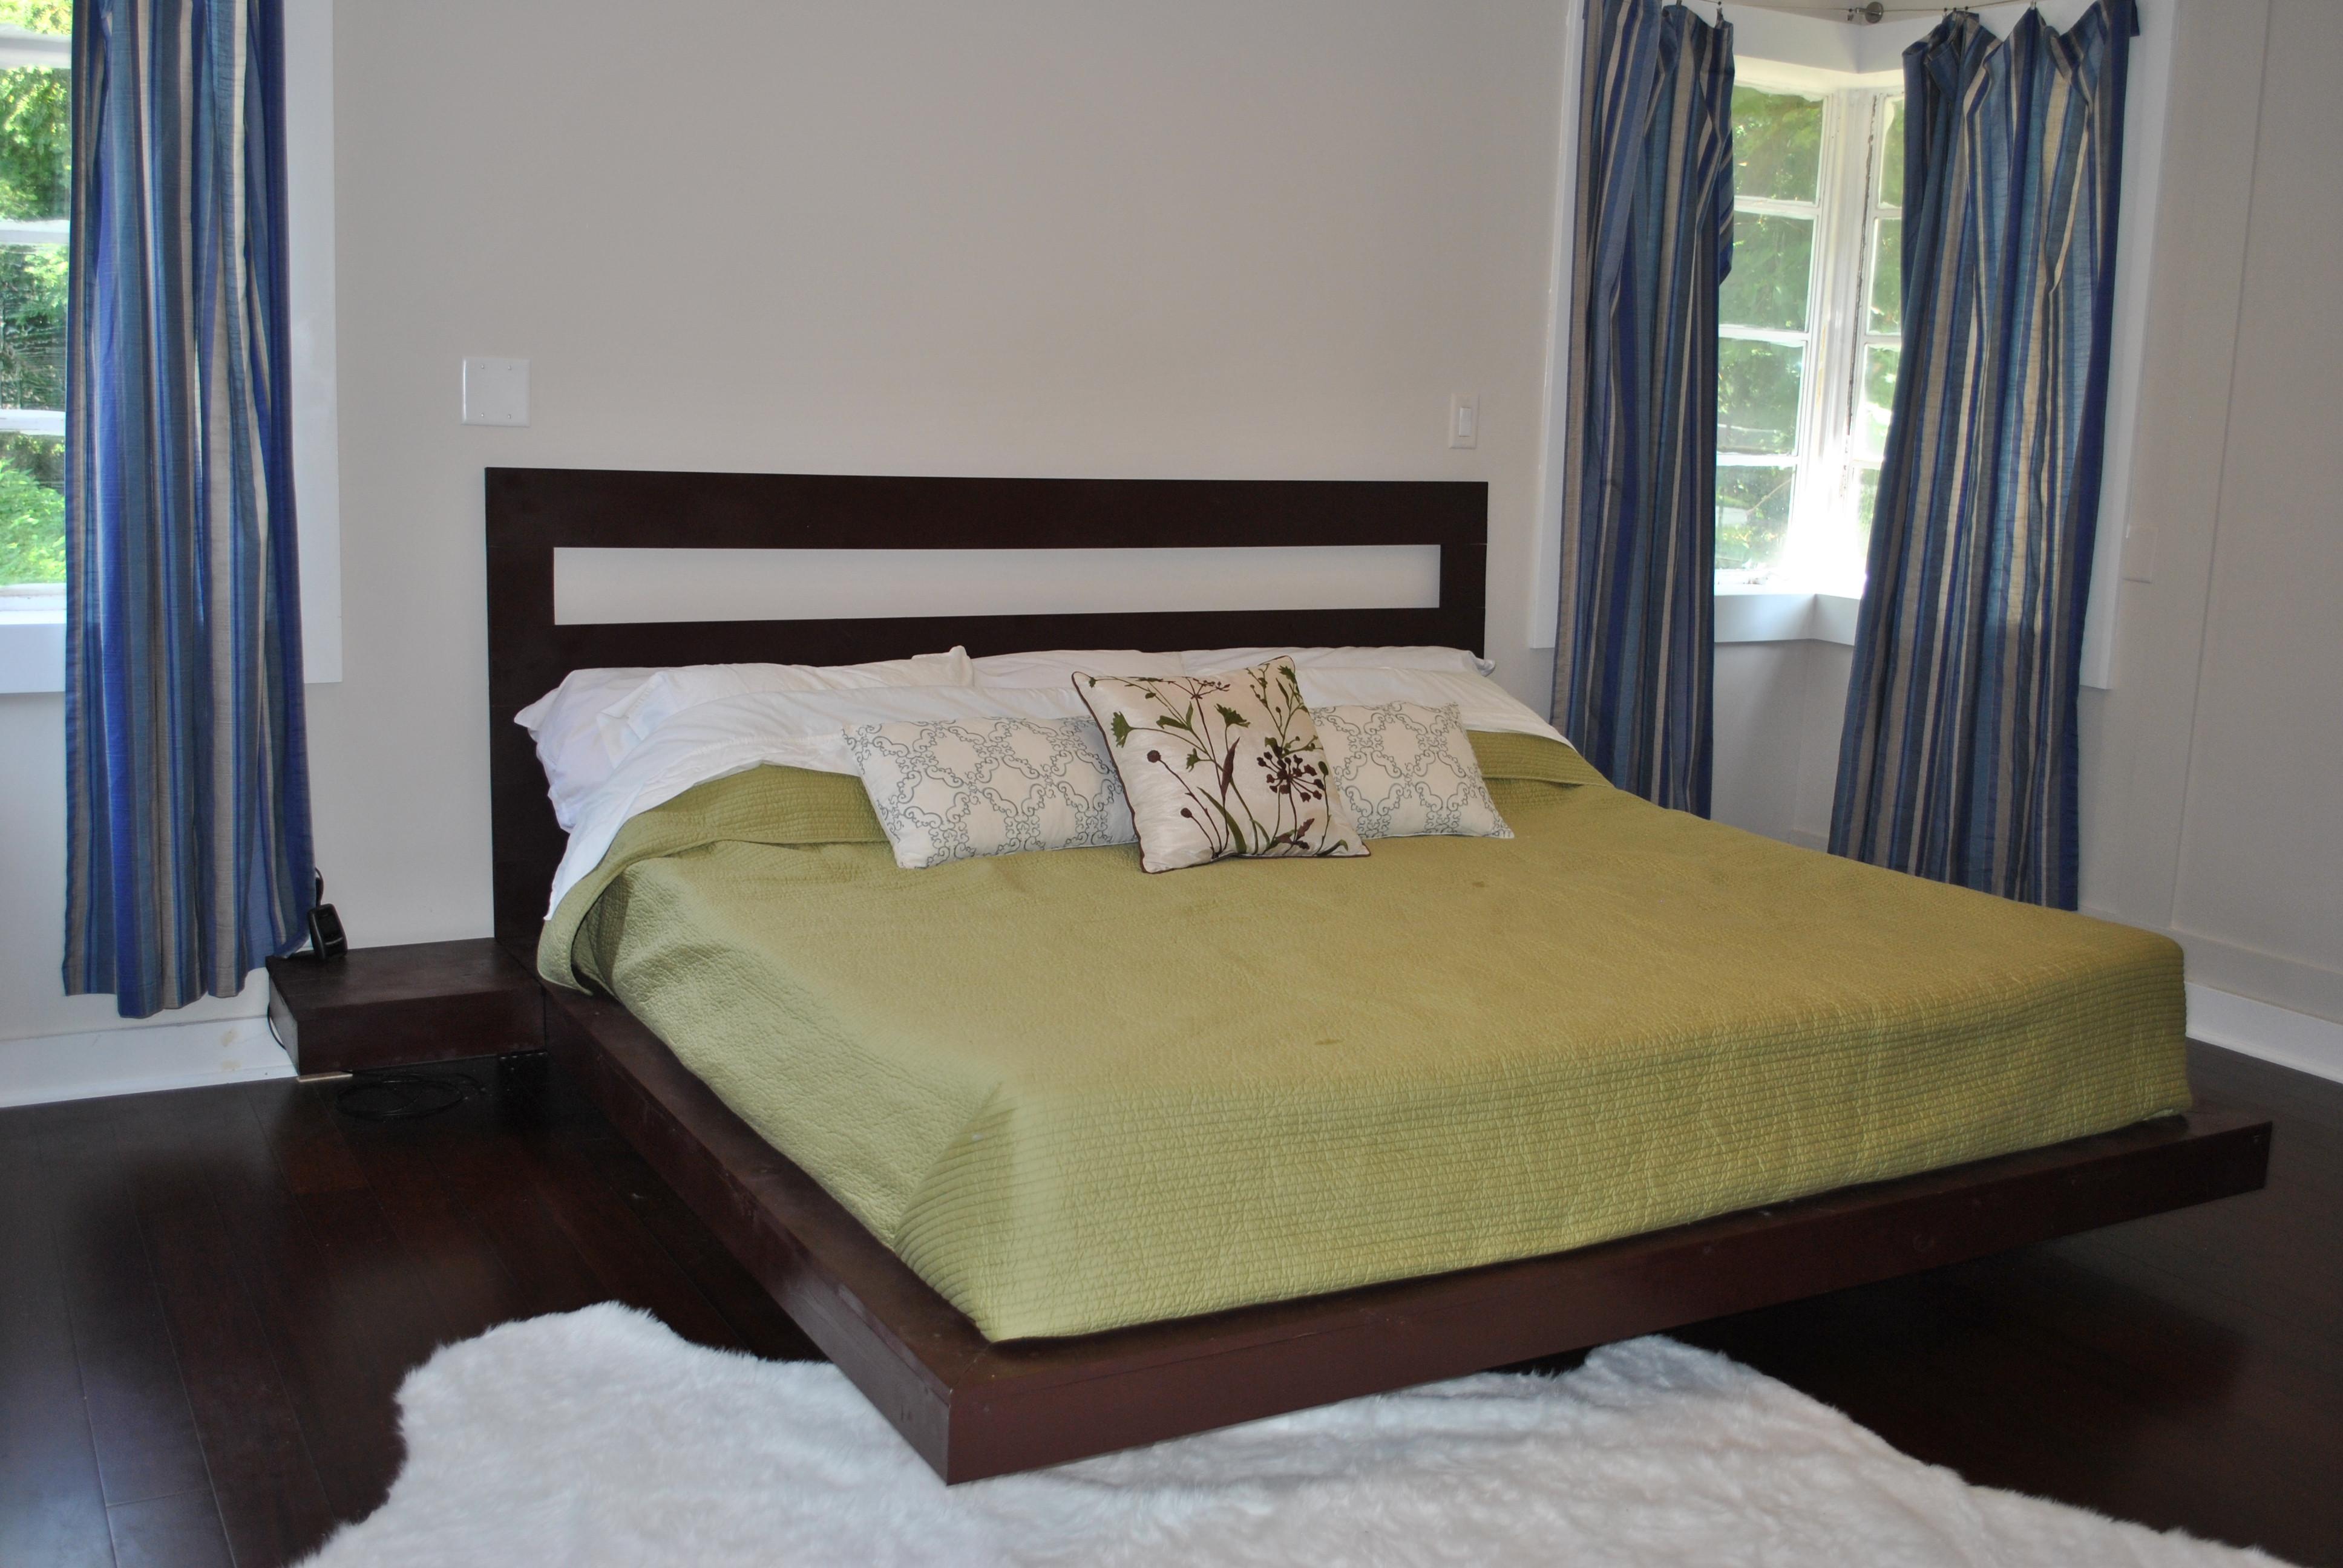 Best ideas about DIY Platform Bed . Save or Pin $25 Floating King Platform Bed – Dave and Kelly Davis Now.